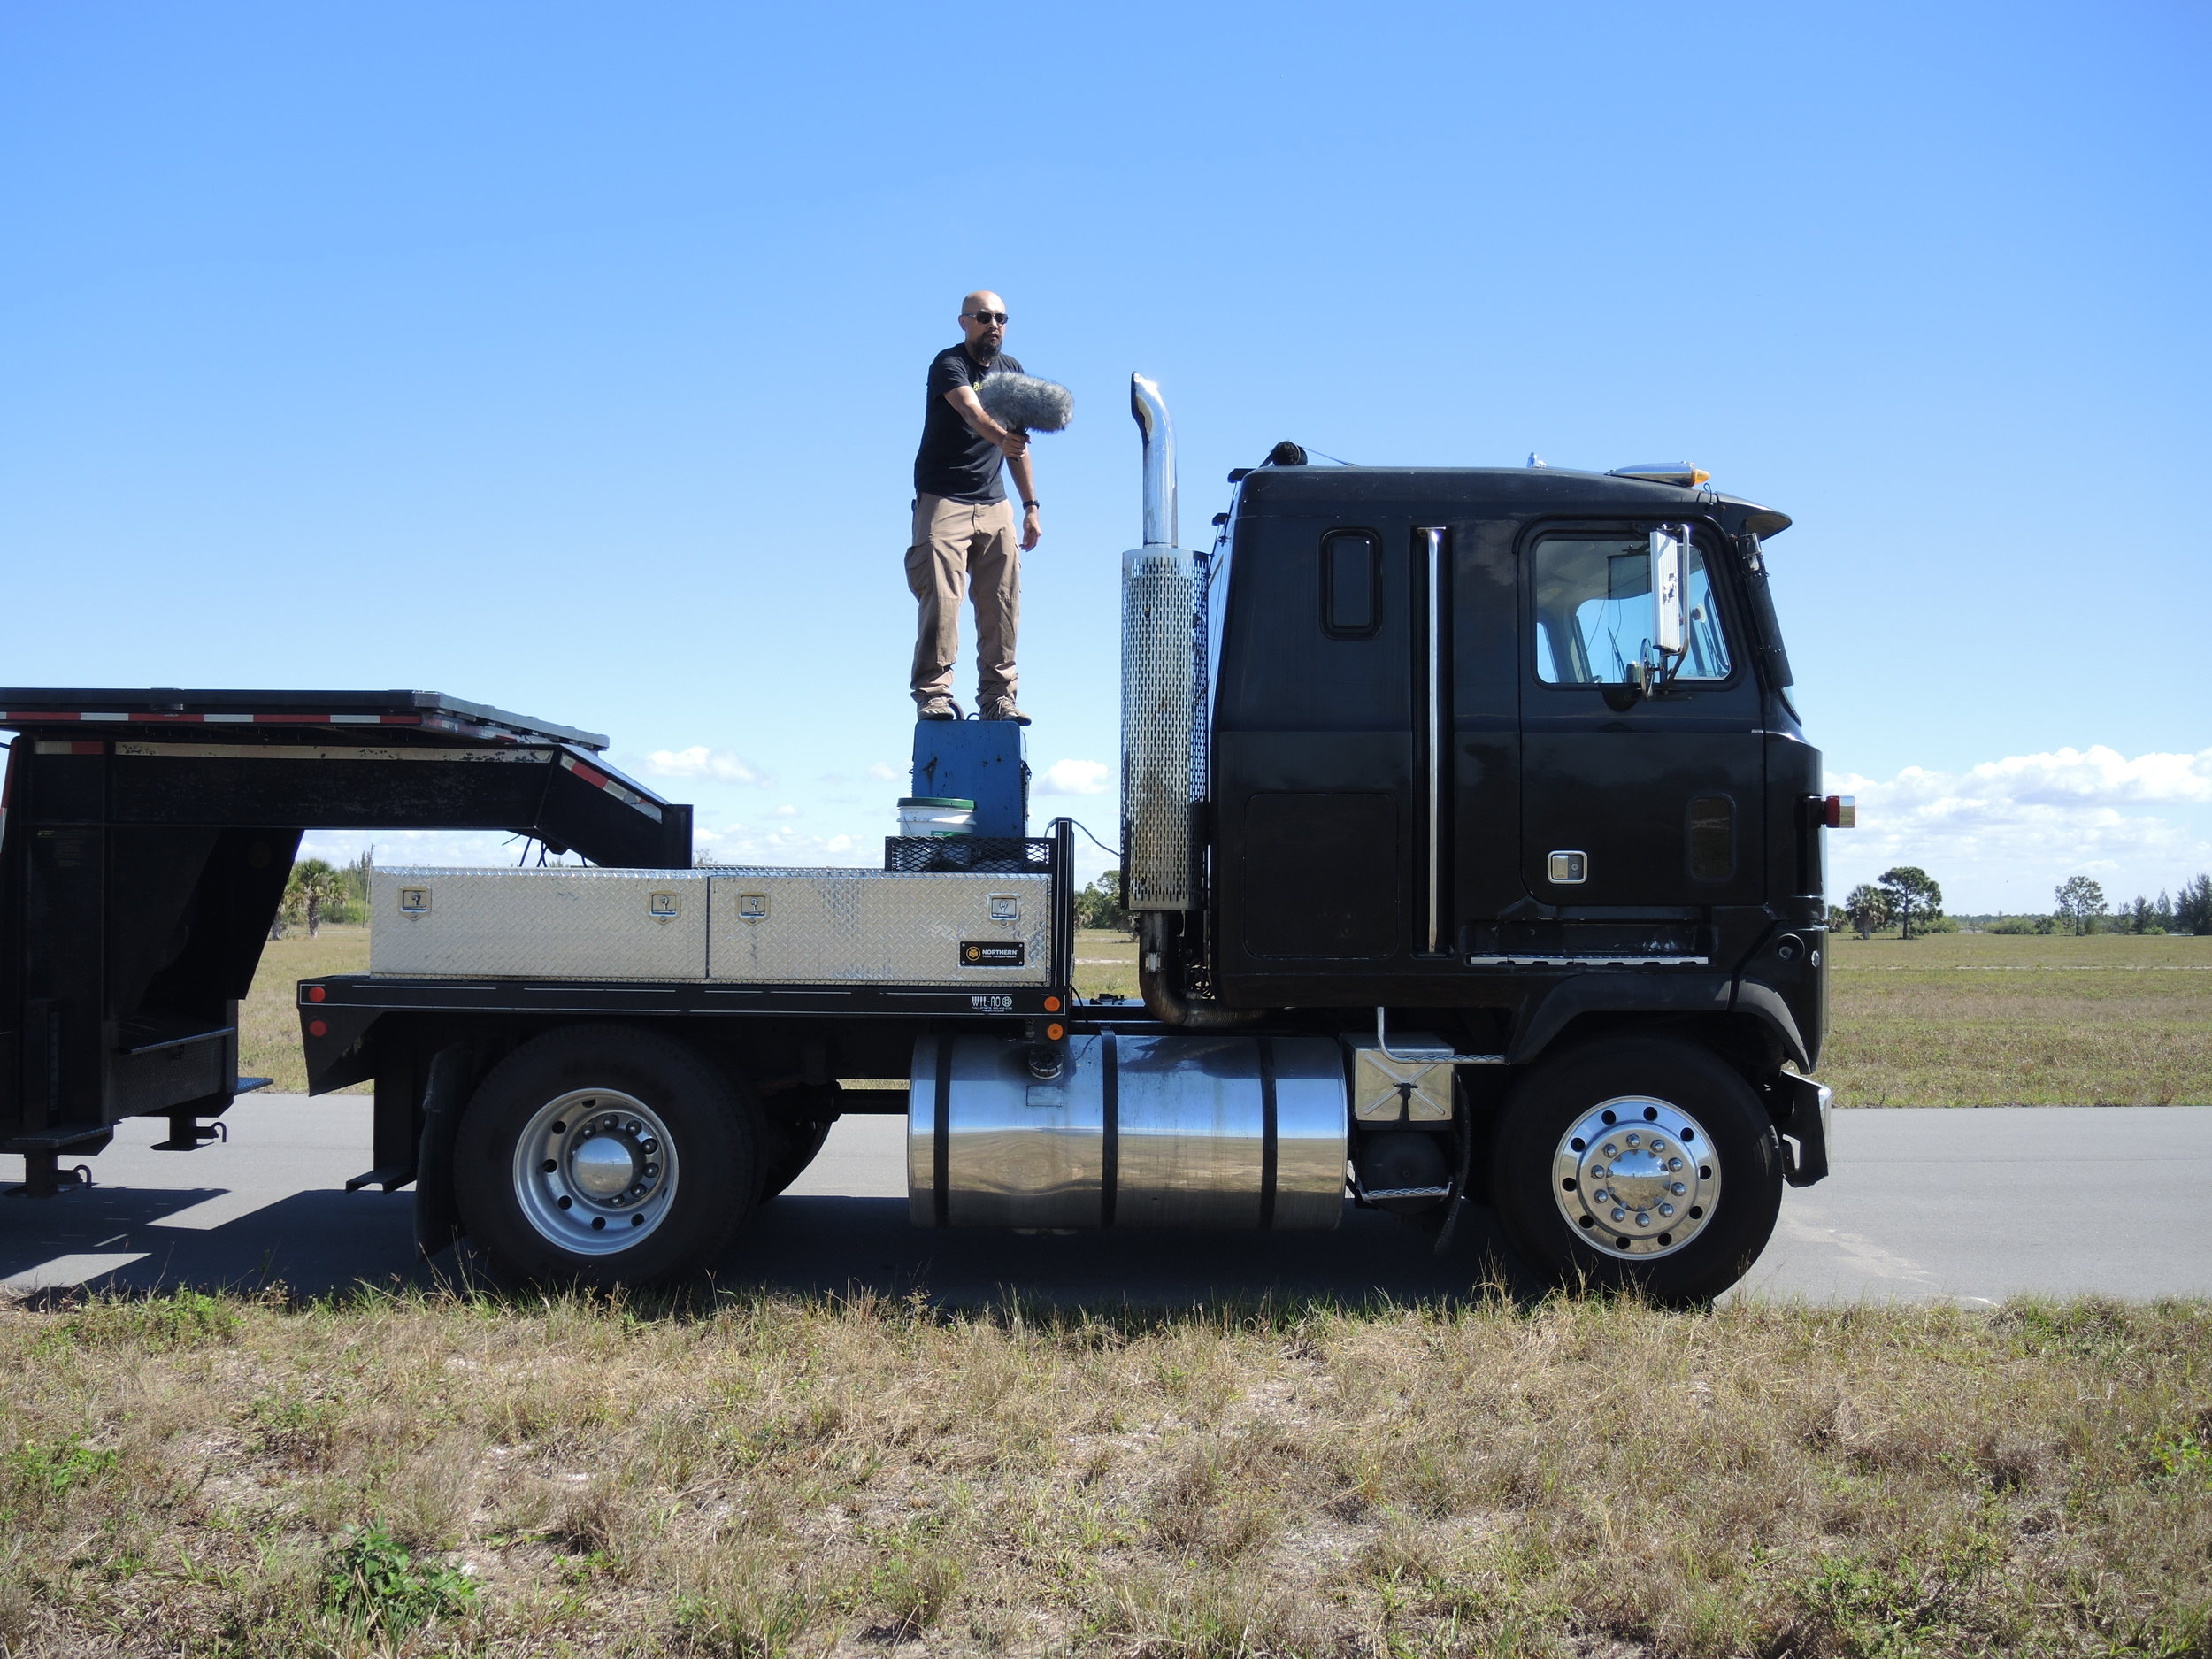 Vehicle Semi-Truck DSCN2397.JPG